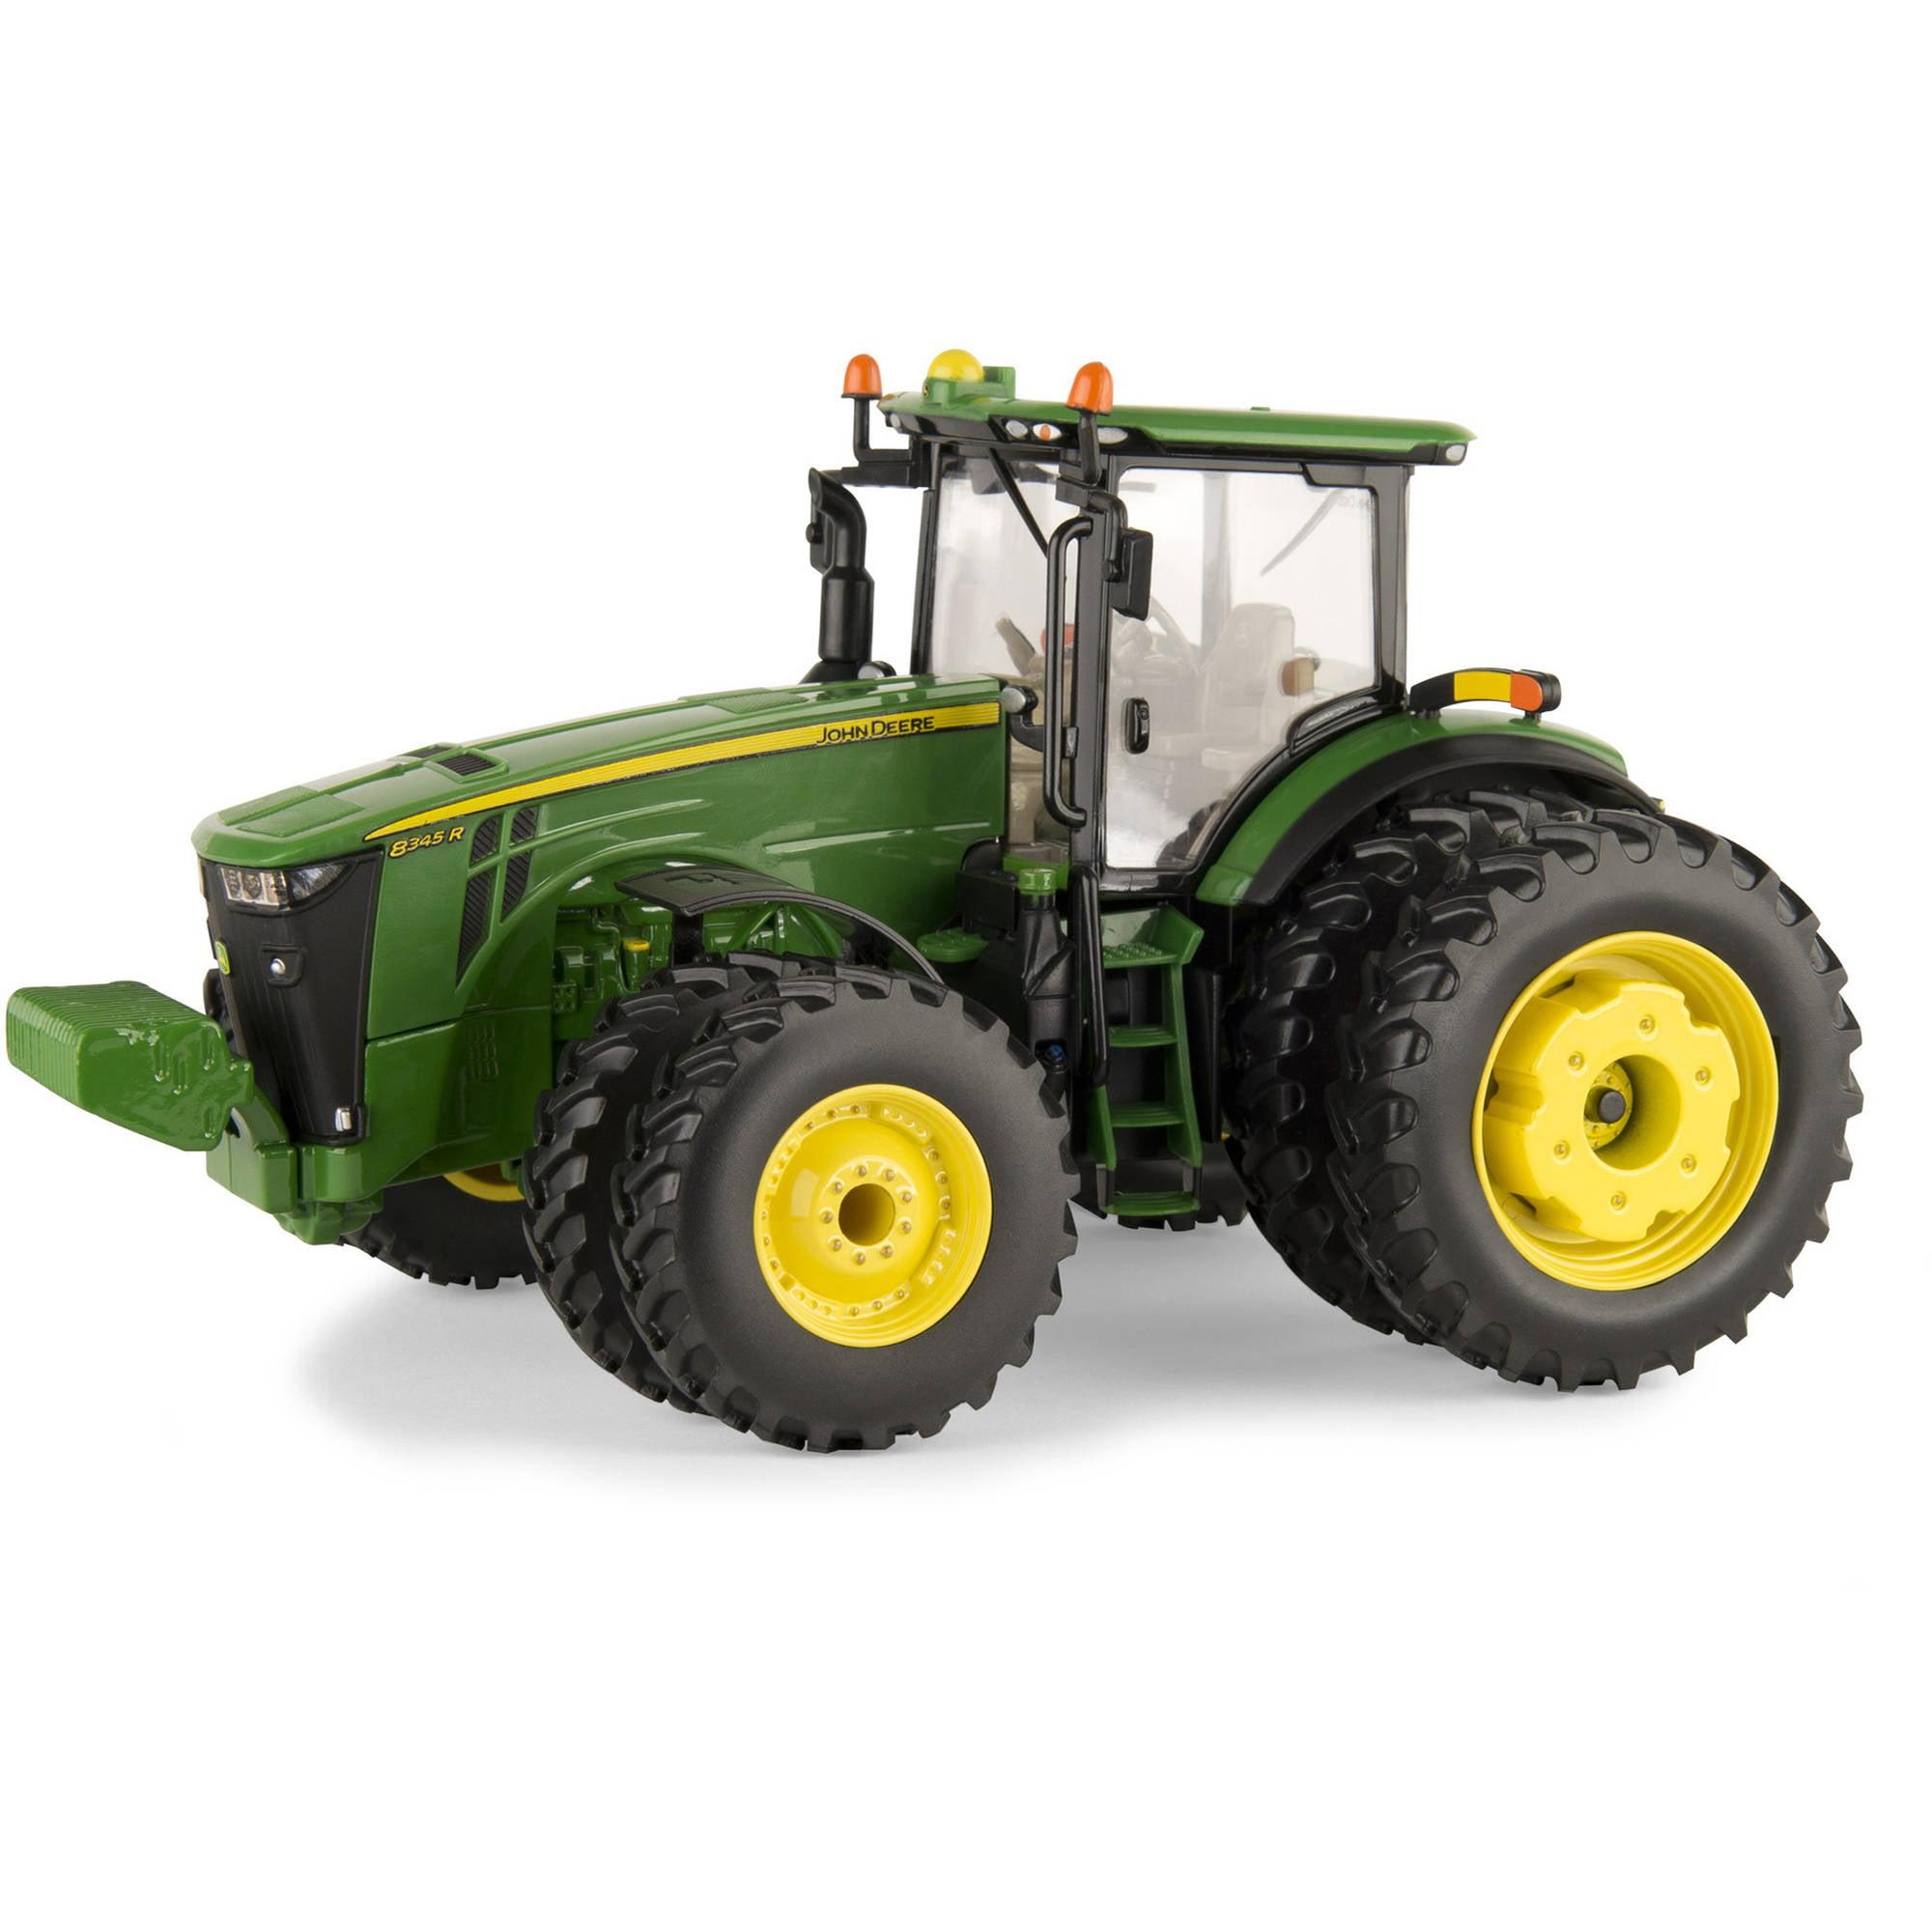 ertl 1 32 john deere 8345r tractor from the prestige collection ertl 1 32 john deere 8345r tractor from the prestige collection walmart com